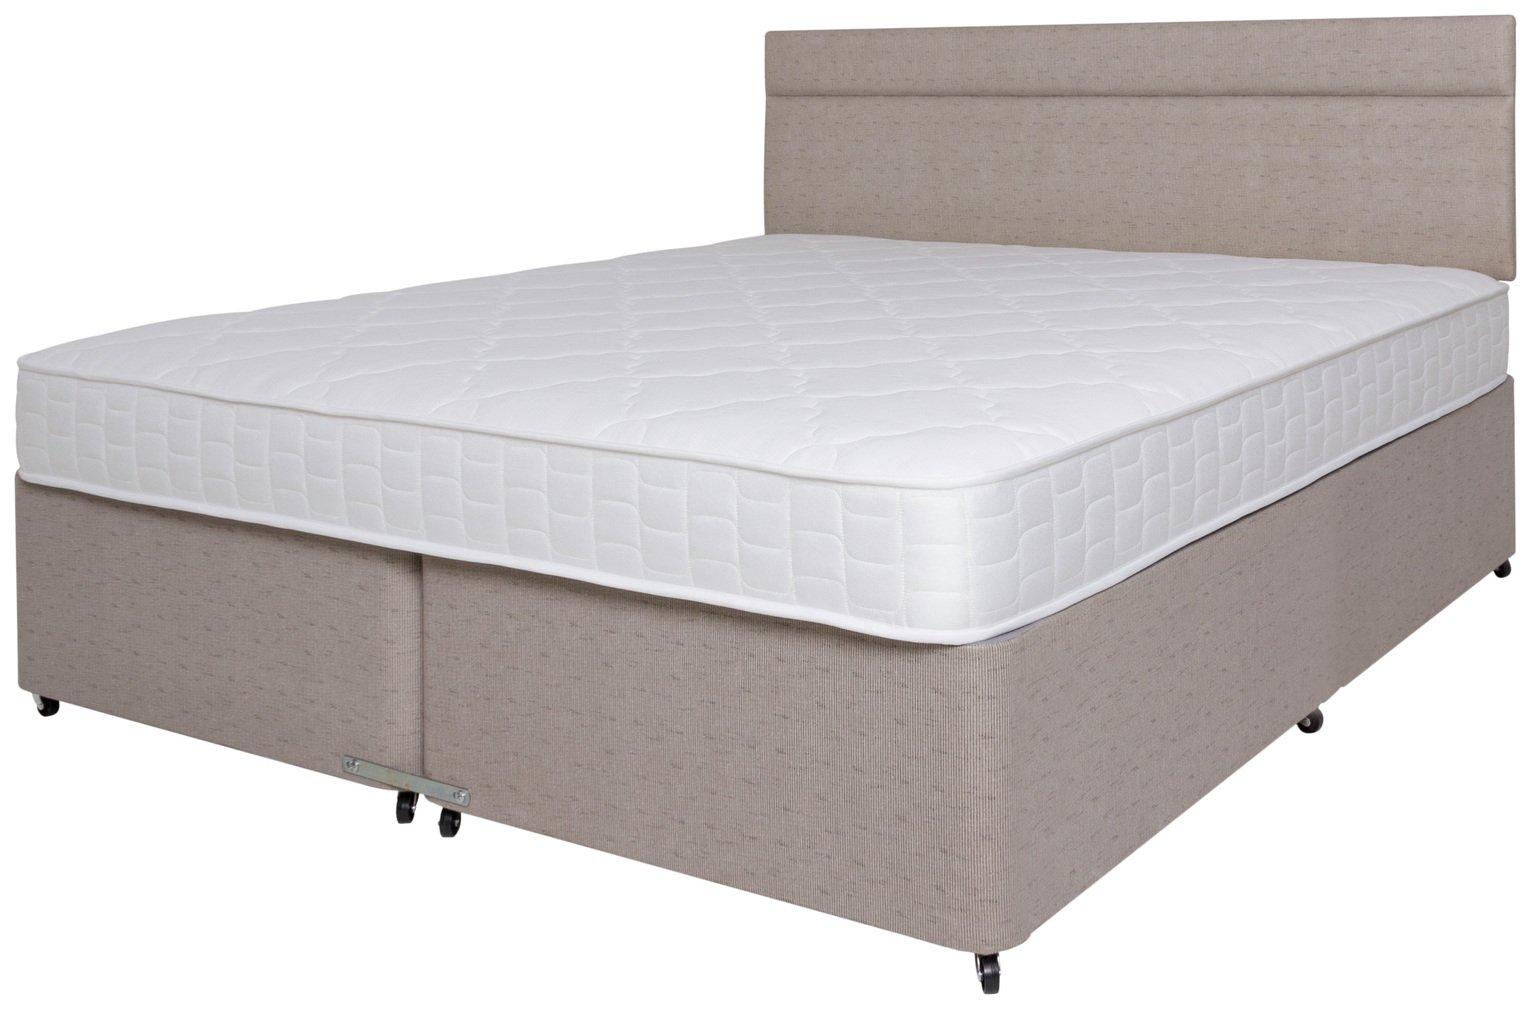 Airsprung Bower Memory Divan Bed - Superking